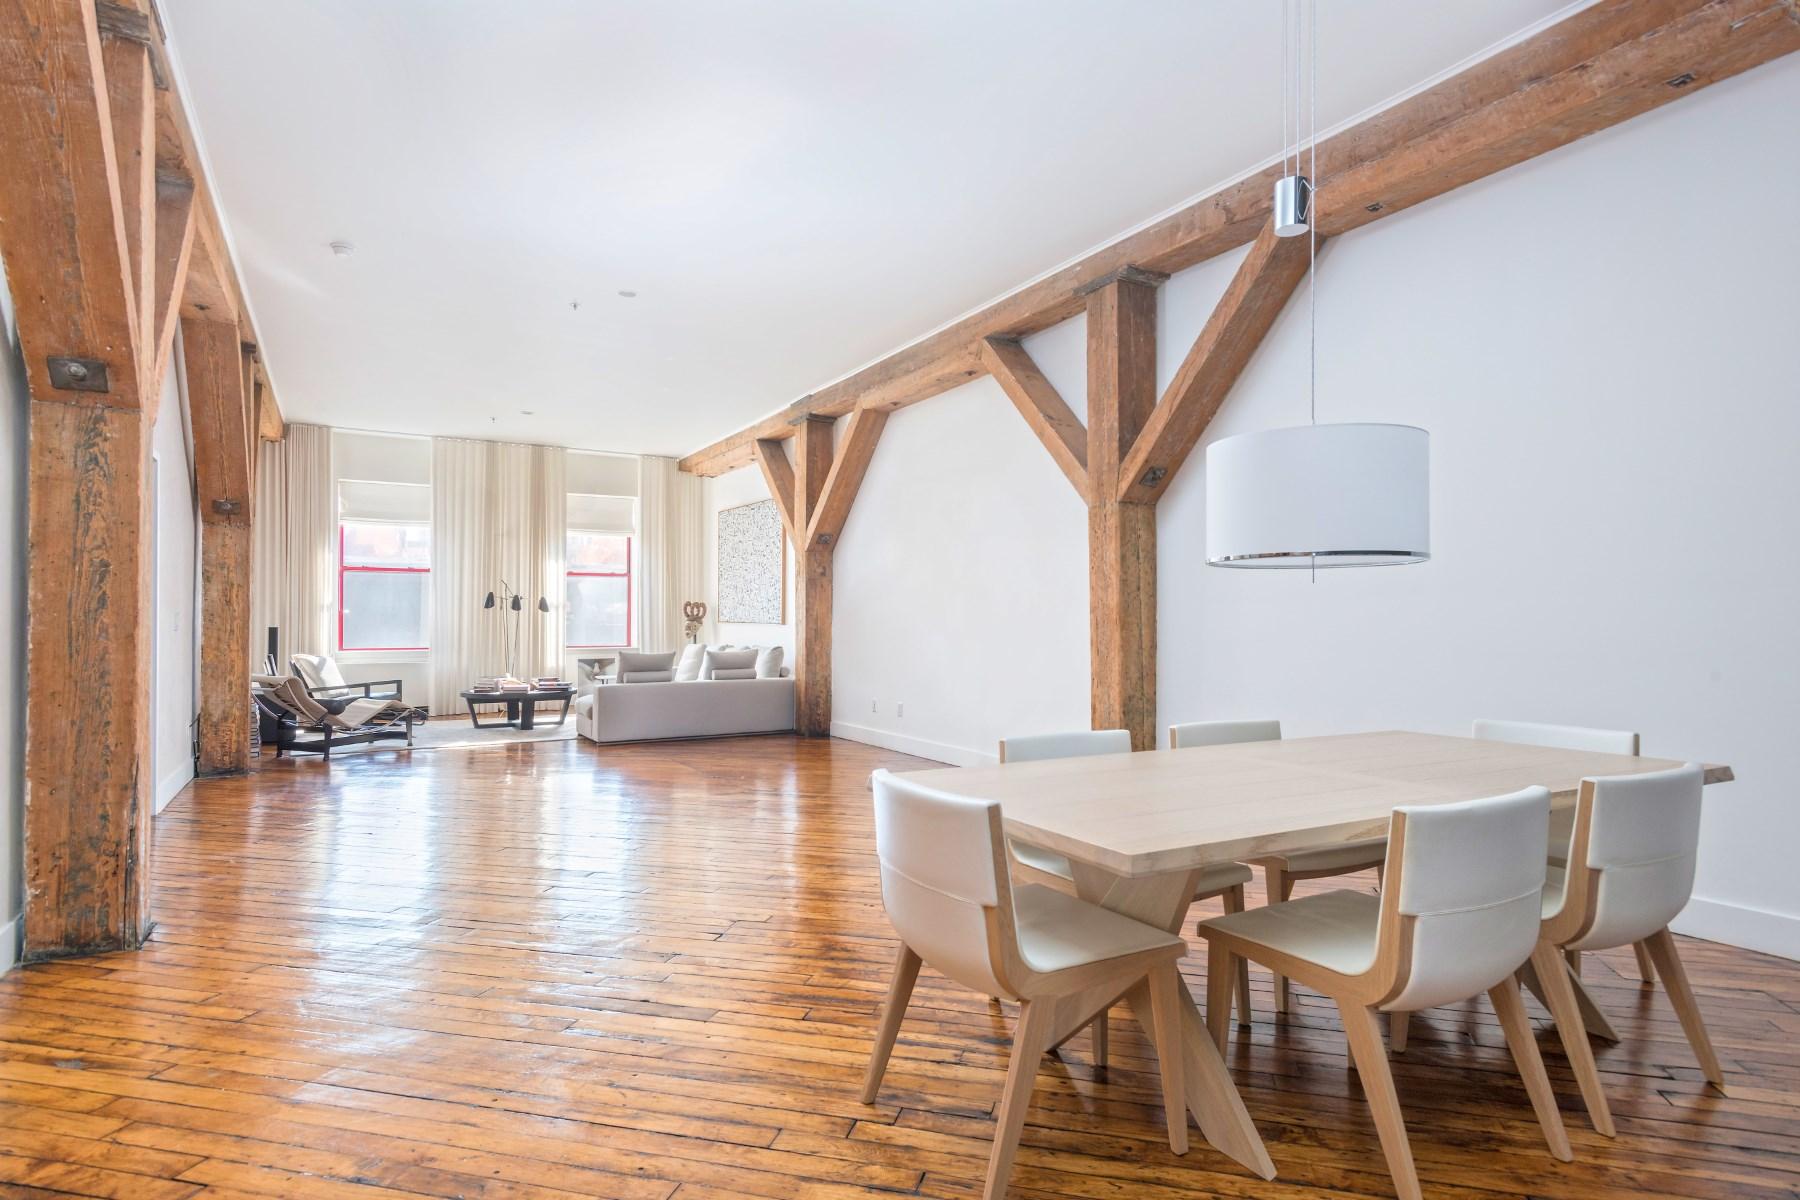 Condominium for Sale at Stunning Authentic Williamsburg Loft 85 North 3rd Street Apt 210 Williamsburg, Brooklyn, New York, 11211 United States